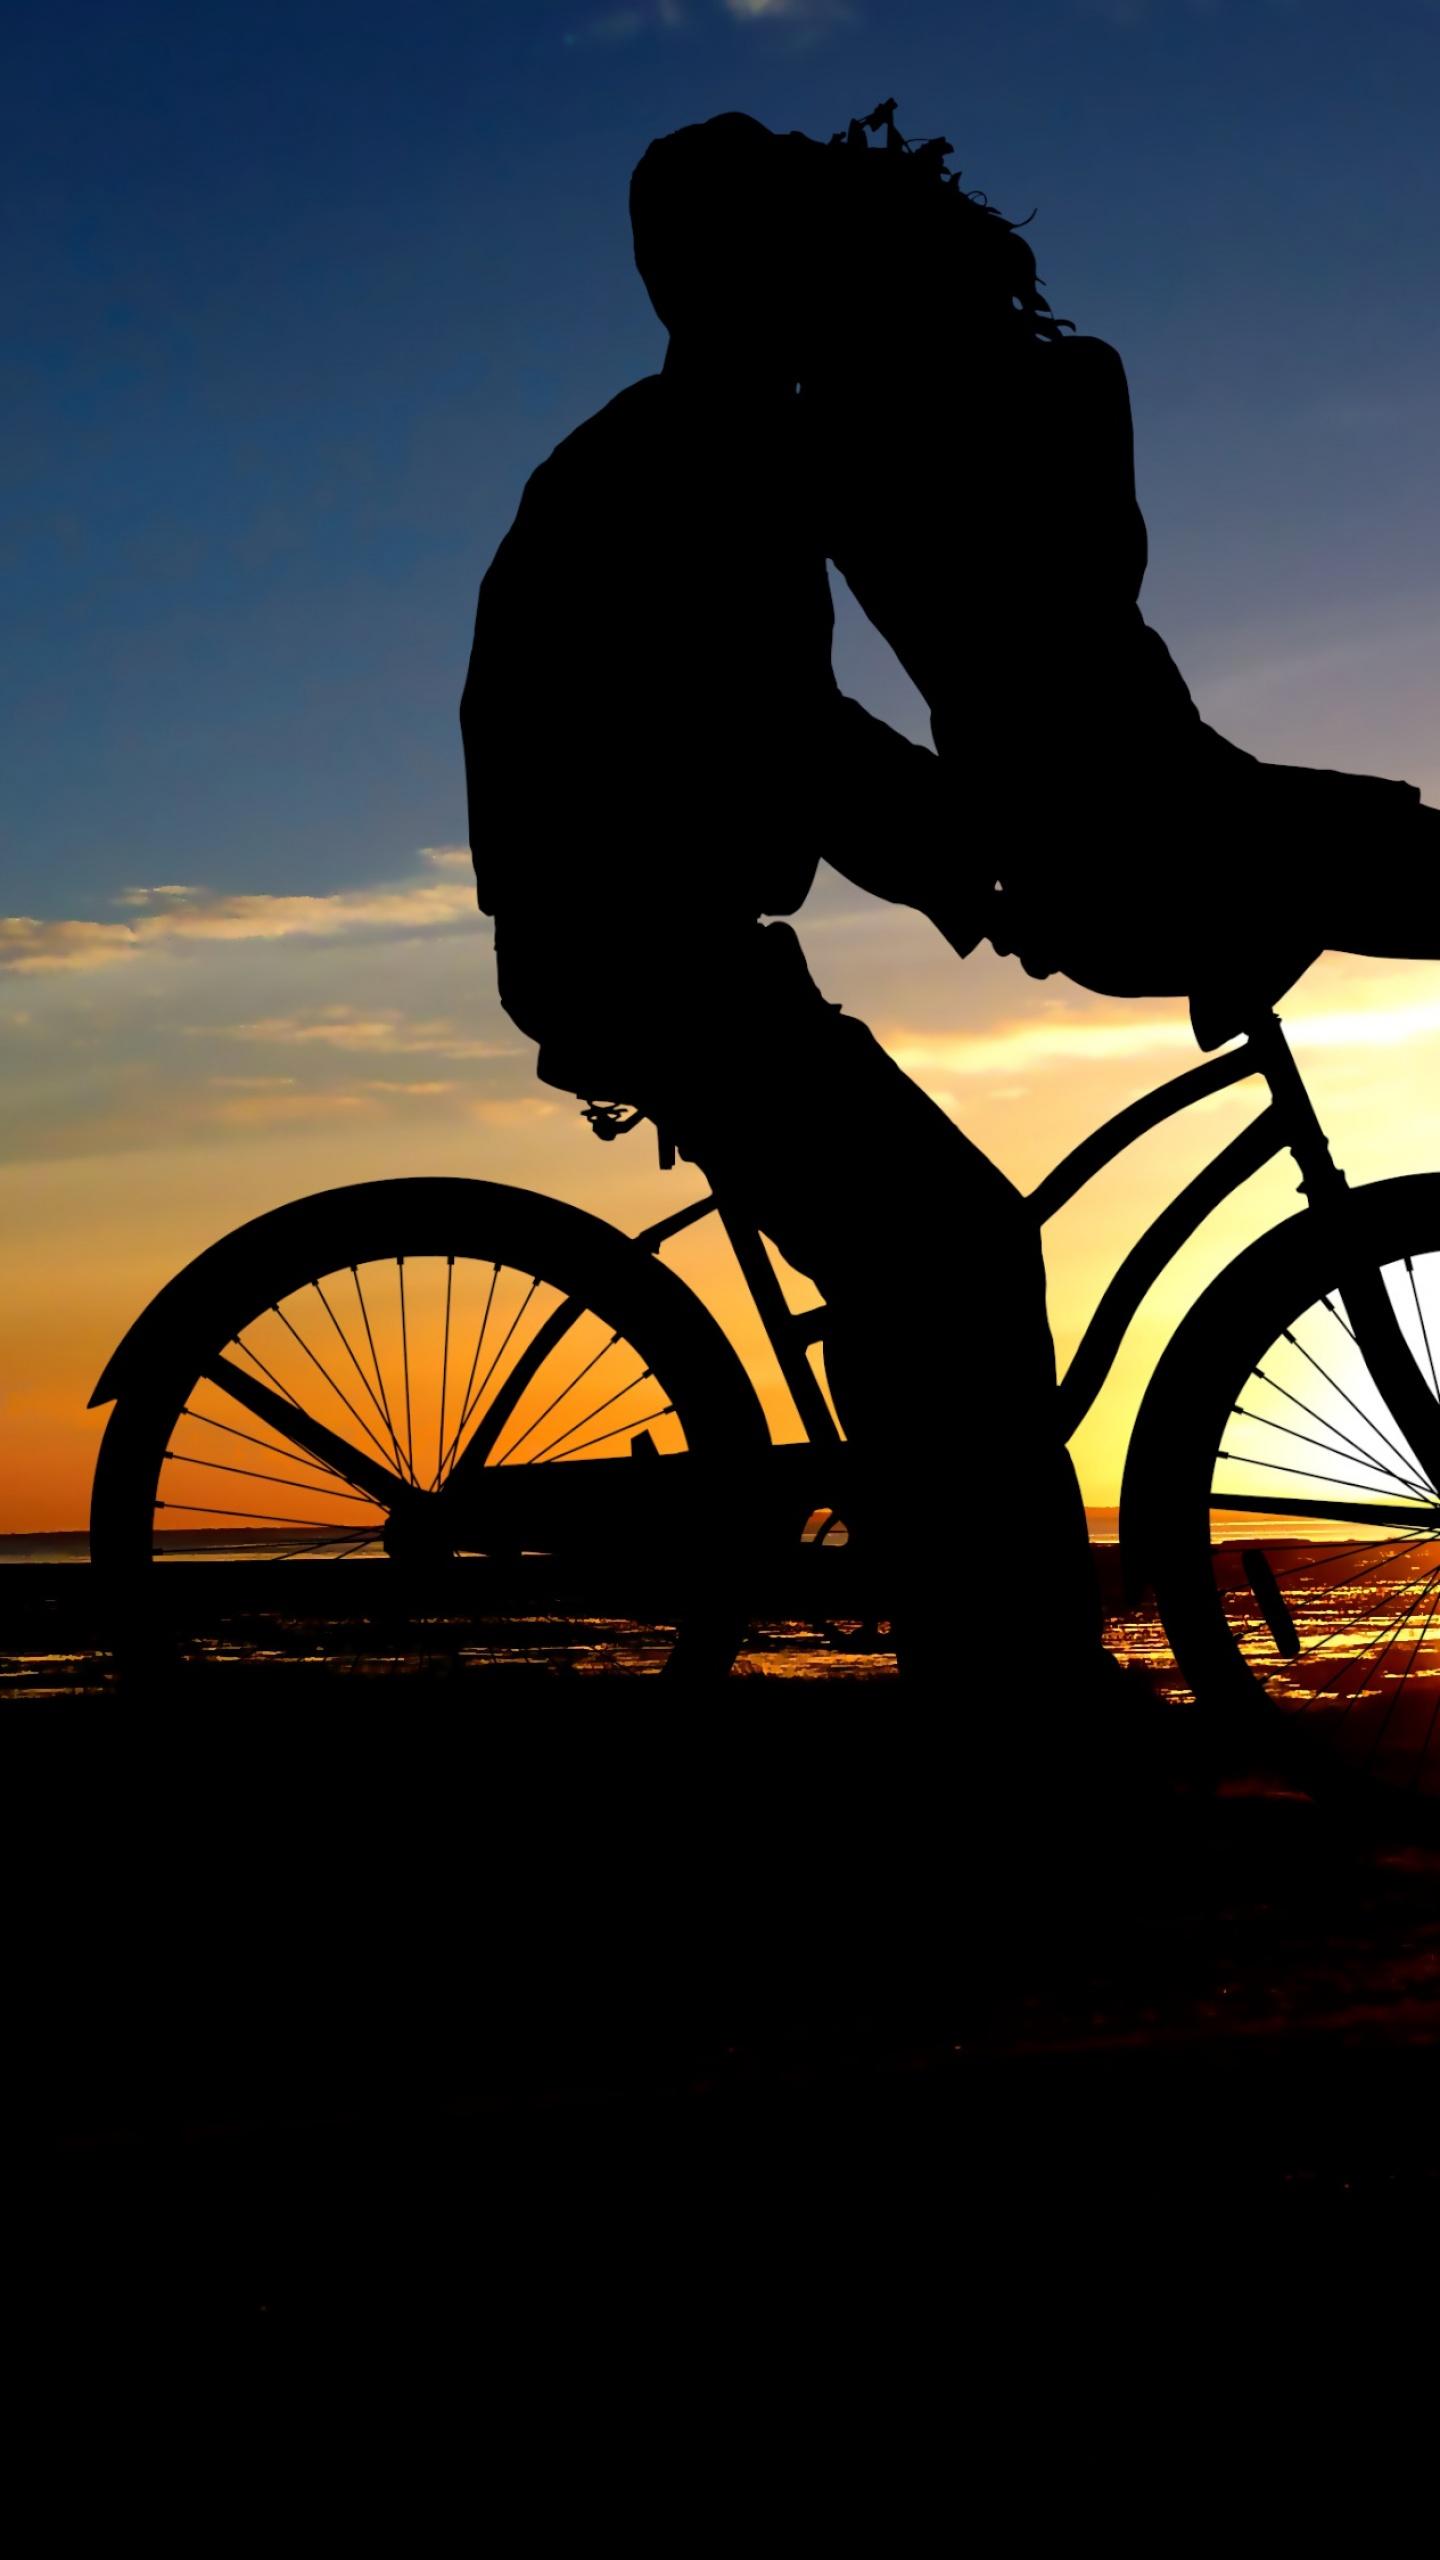 Couple 4k Wallpaper Sunset Romantic Kiss Bicycle Silhouette Dusk Evening Love 1694